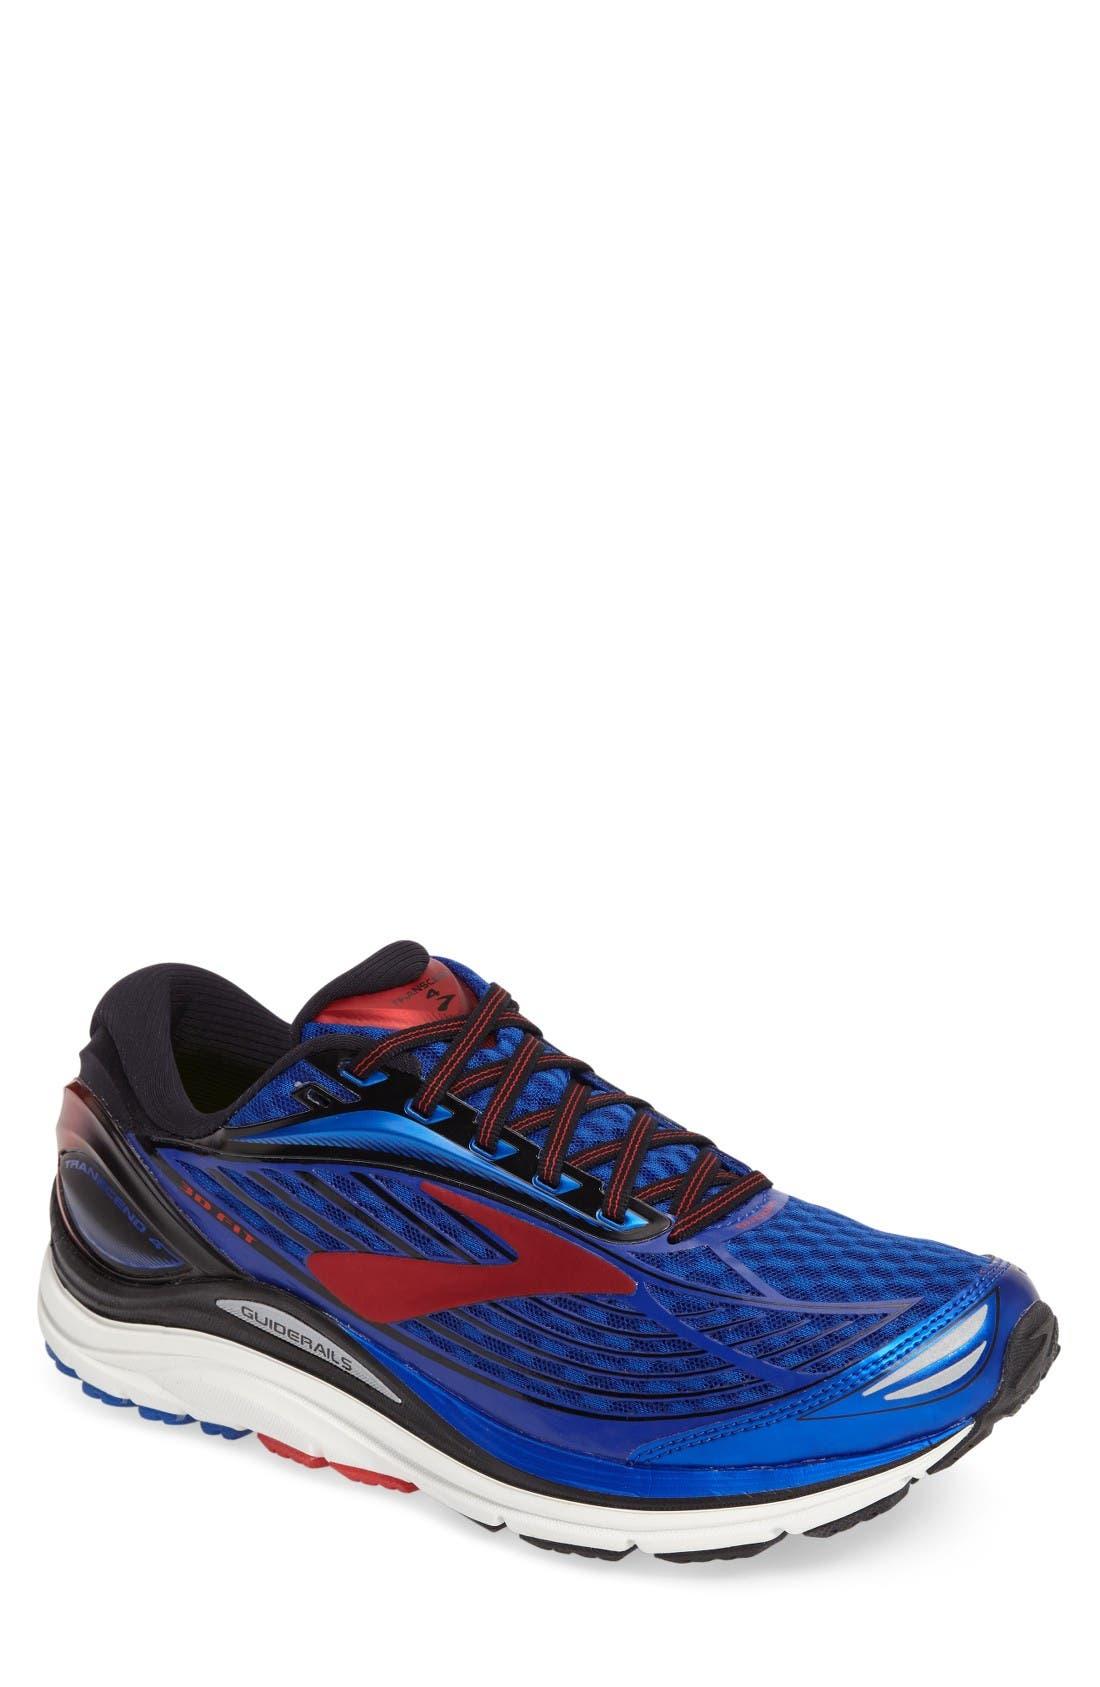 Alternate Image 1 Selected - Brooks Transcend 4 Running Shoe (Men)